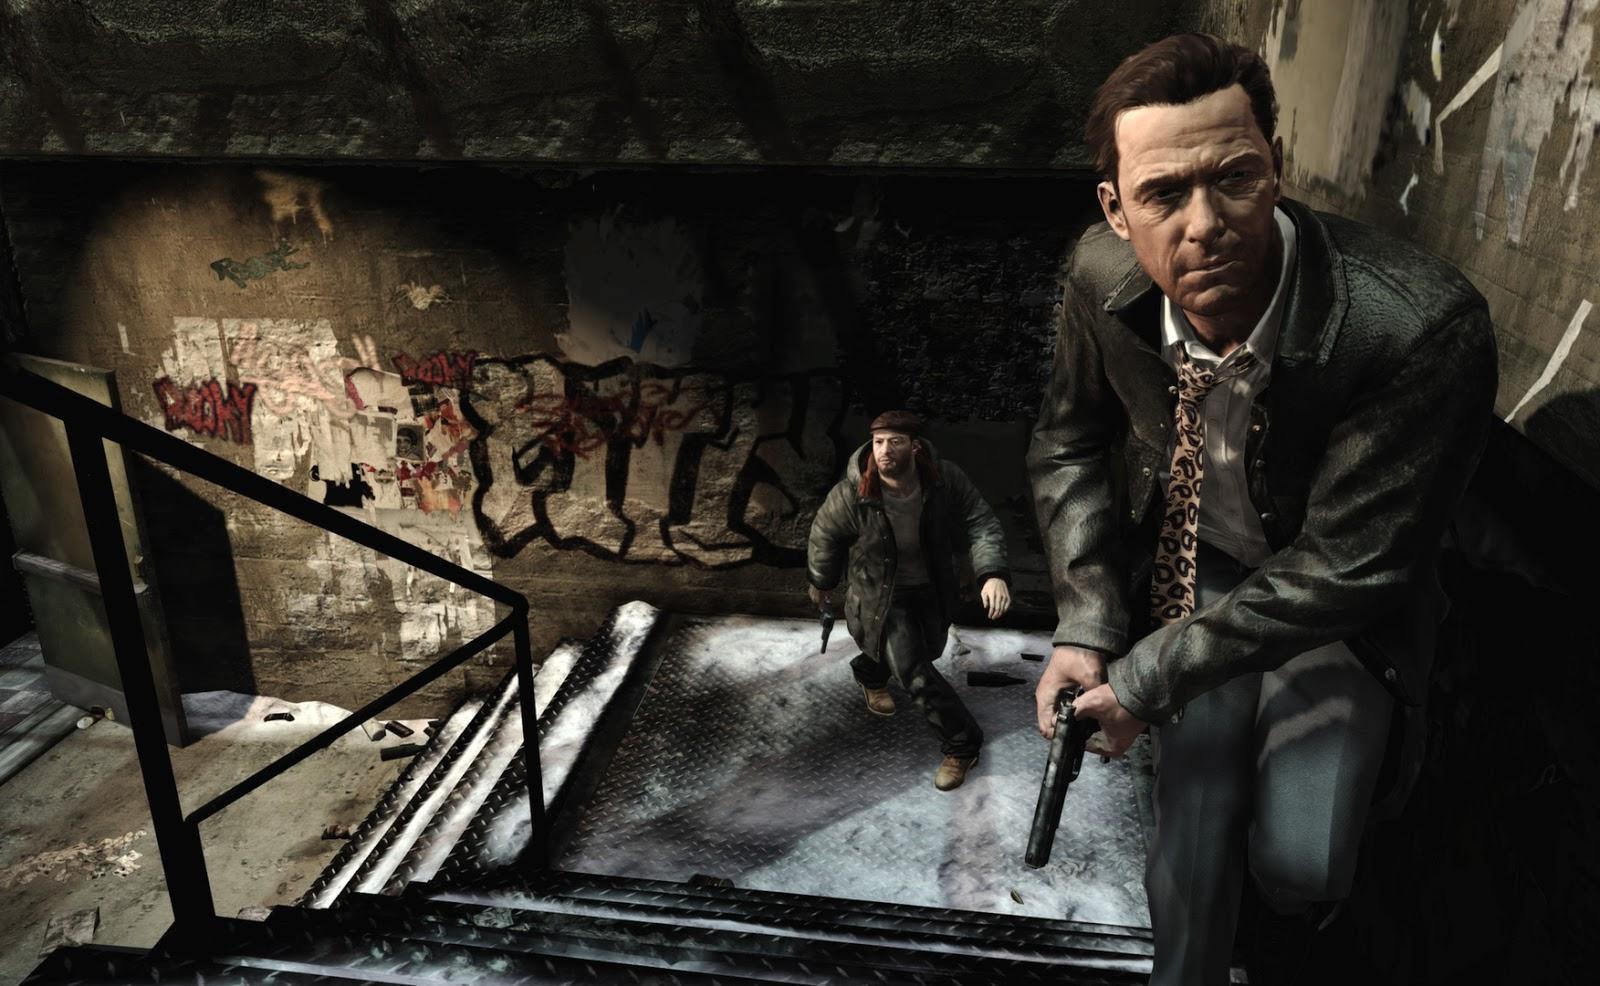 Max Payne 3 Complete Edition ESPAÑOL PC Descargar Full (RELOADED) + REPACK 5 DVD5 (JPW) 2